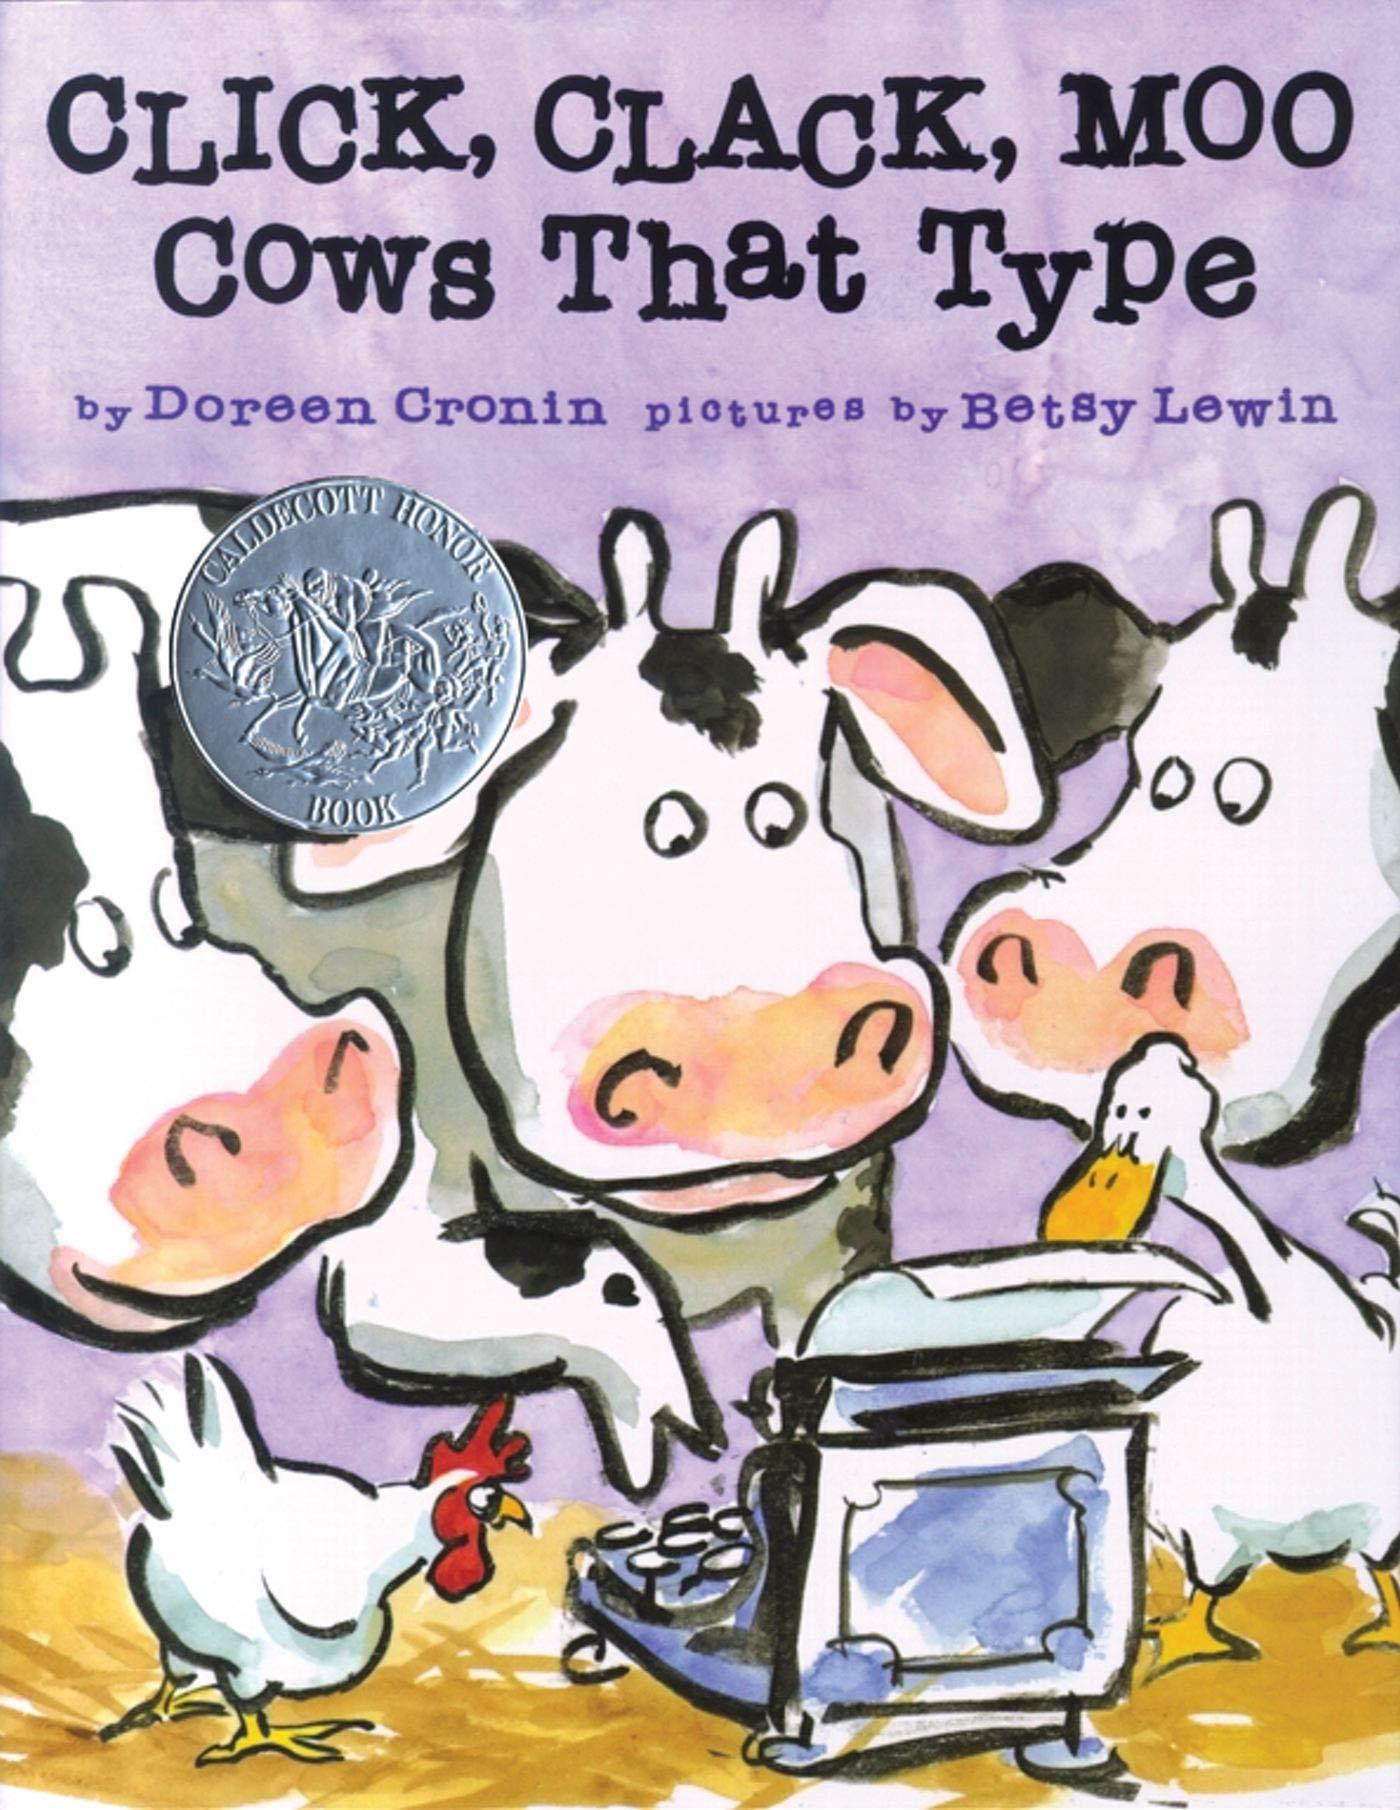 Click, Clack, Moo Cows That Type: Doreen Cronin, Betsy Lewin:  9781416903482: Amazon.com: Books